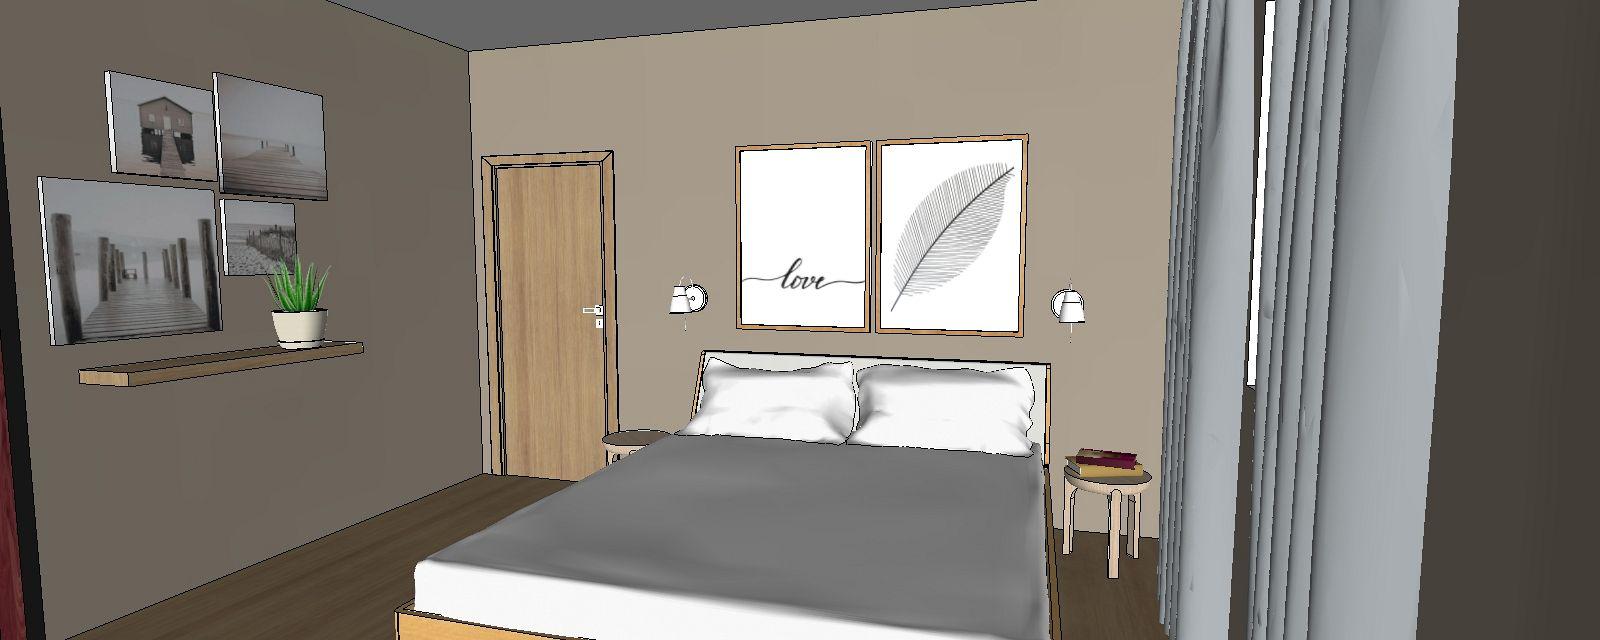 3d návrh interiéru spálňa